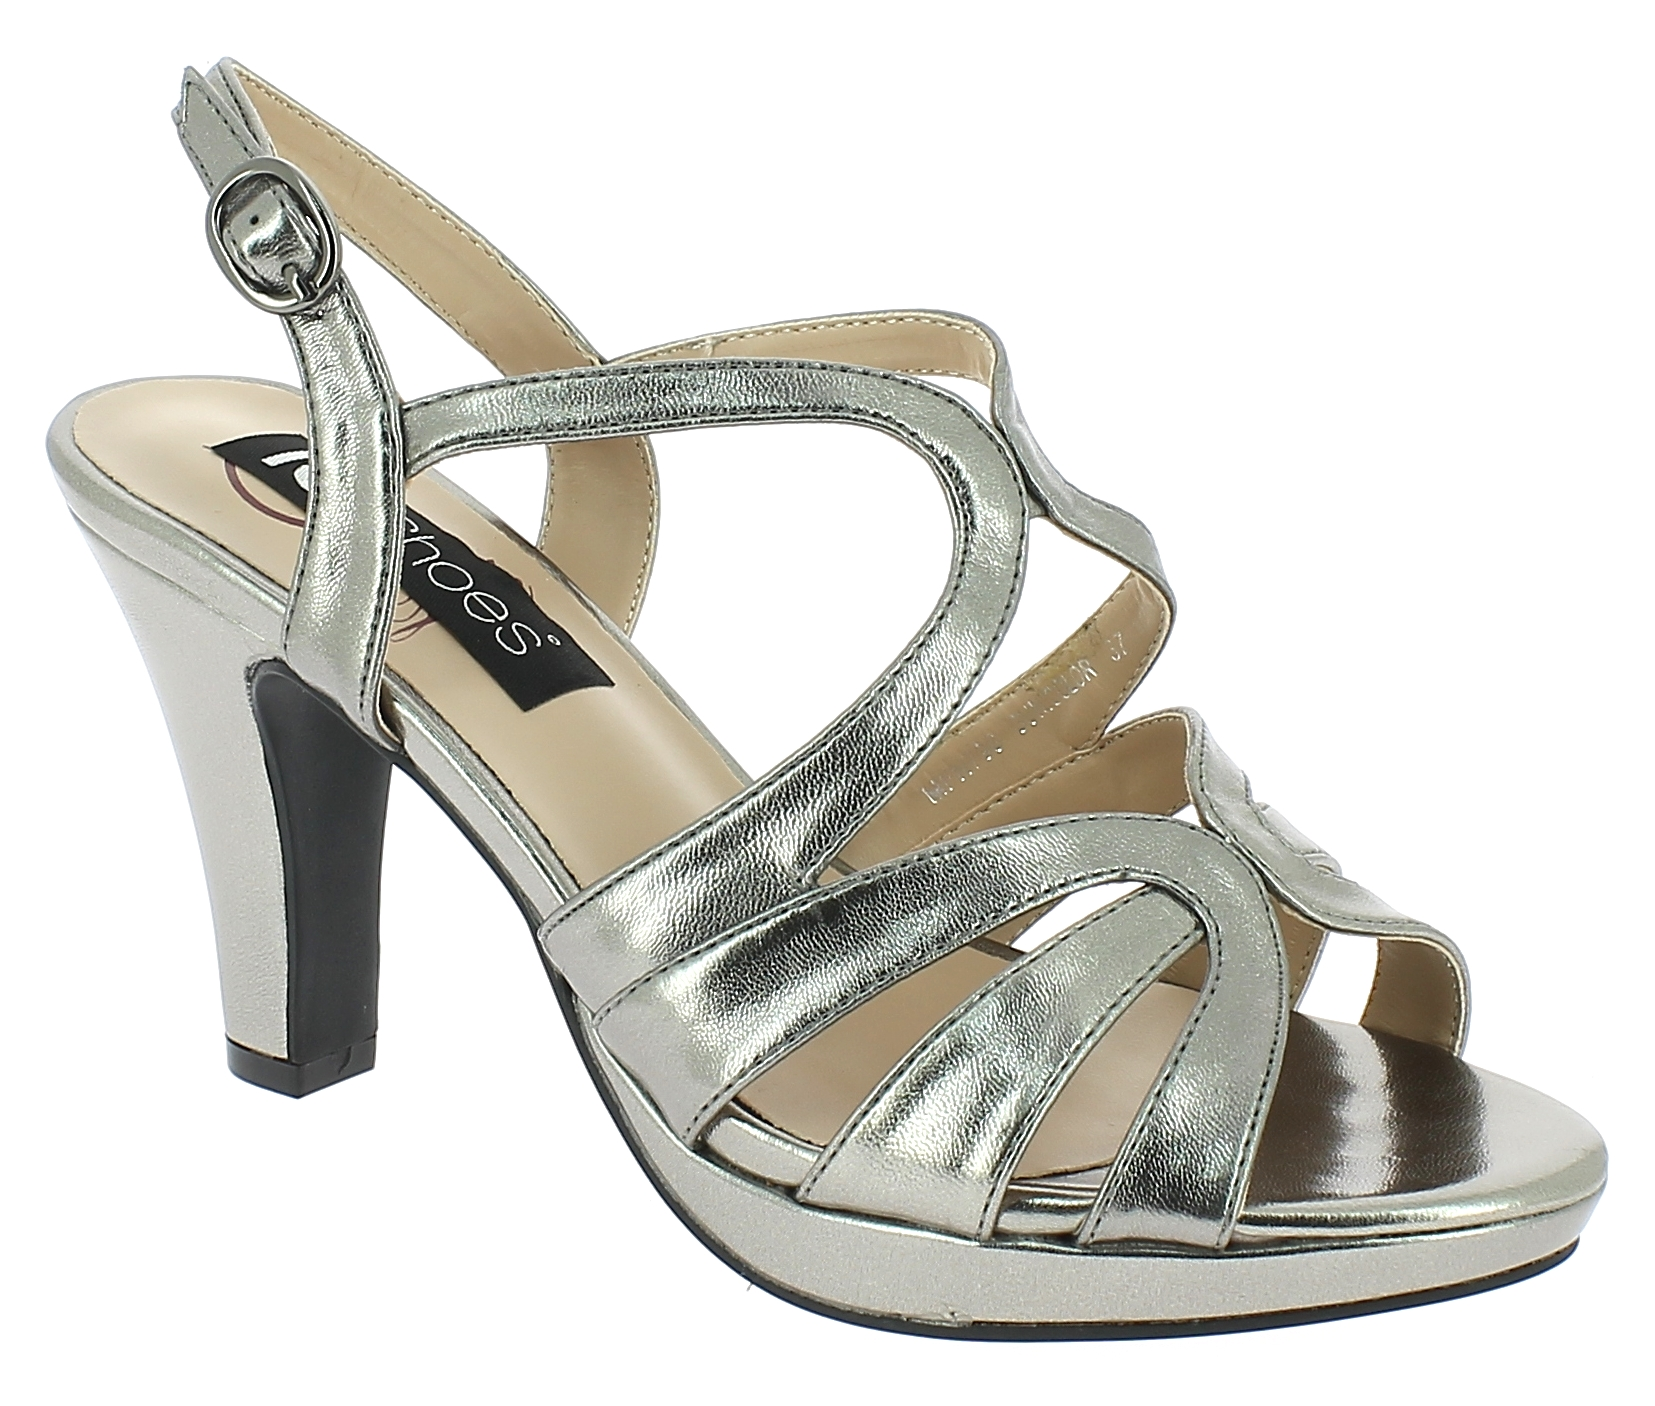 IQSHOES Γυναικείο Πέδιλο MFN798 Μπρονζέ - IqShoes - MFN798 GUN-bronze-36/1/34/7 παπούτσια  πέδιλα